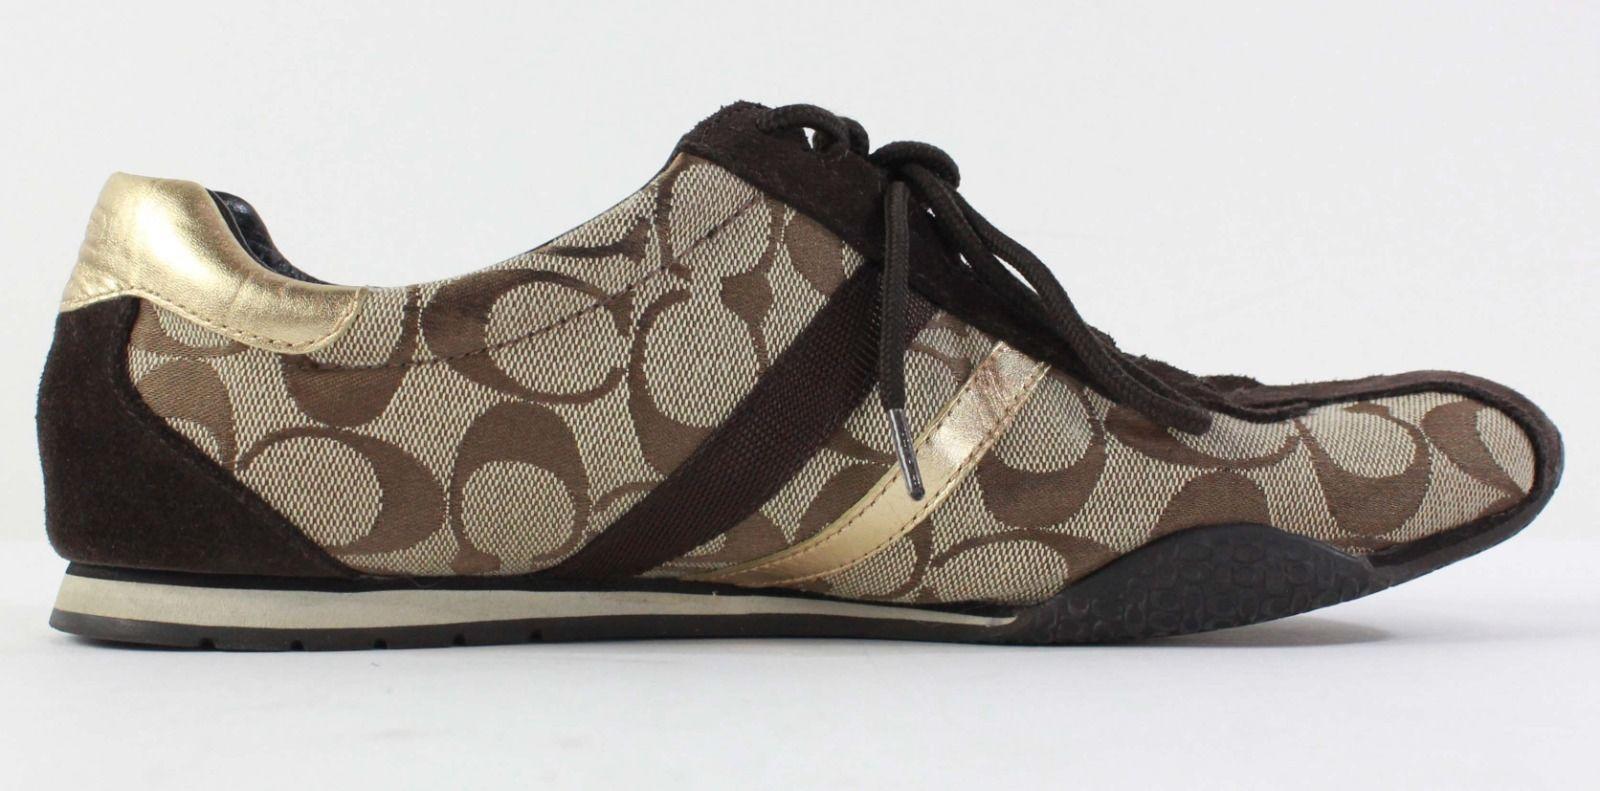 casual dress tennis shoes photo - 1